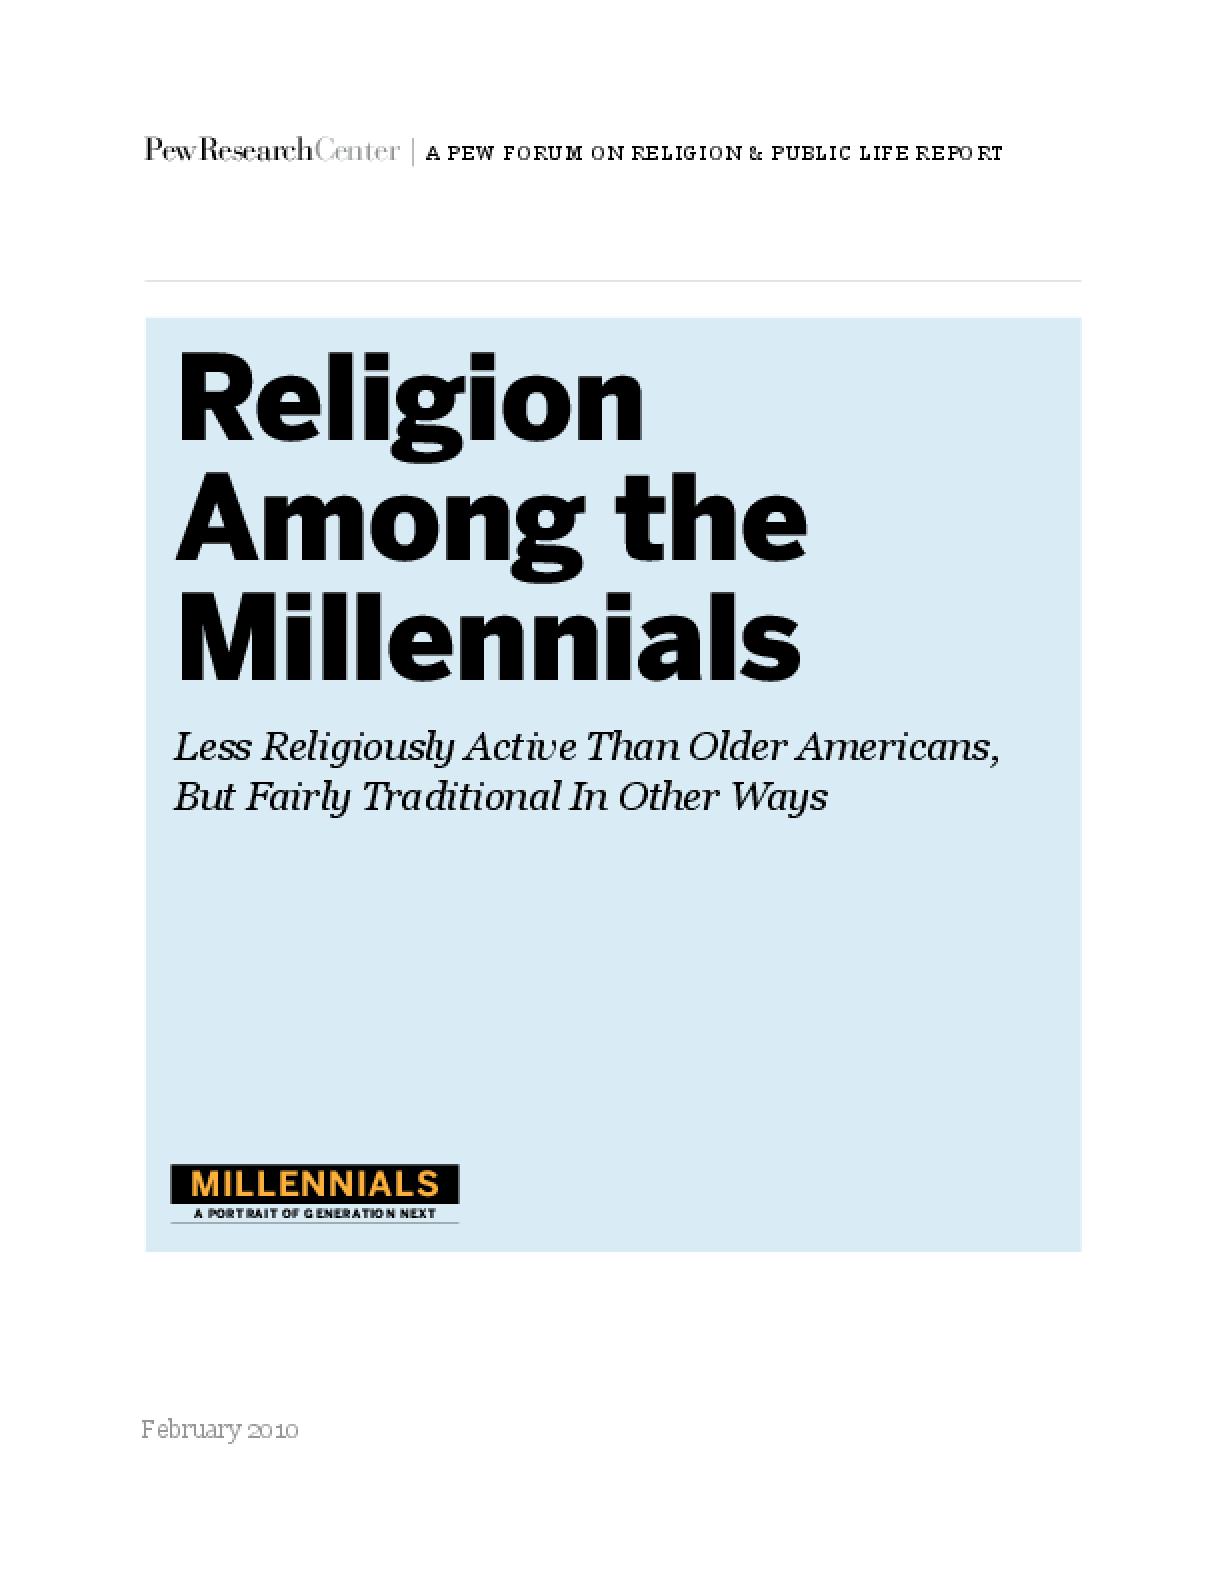 Religion Among the Millennials